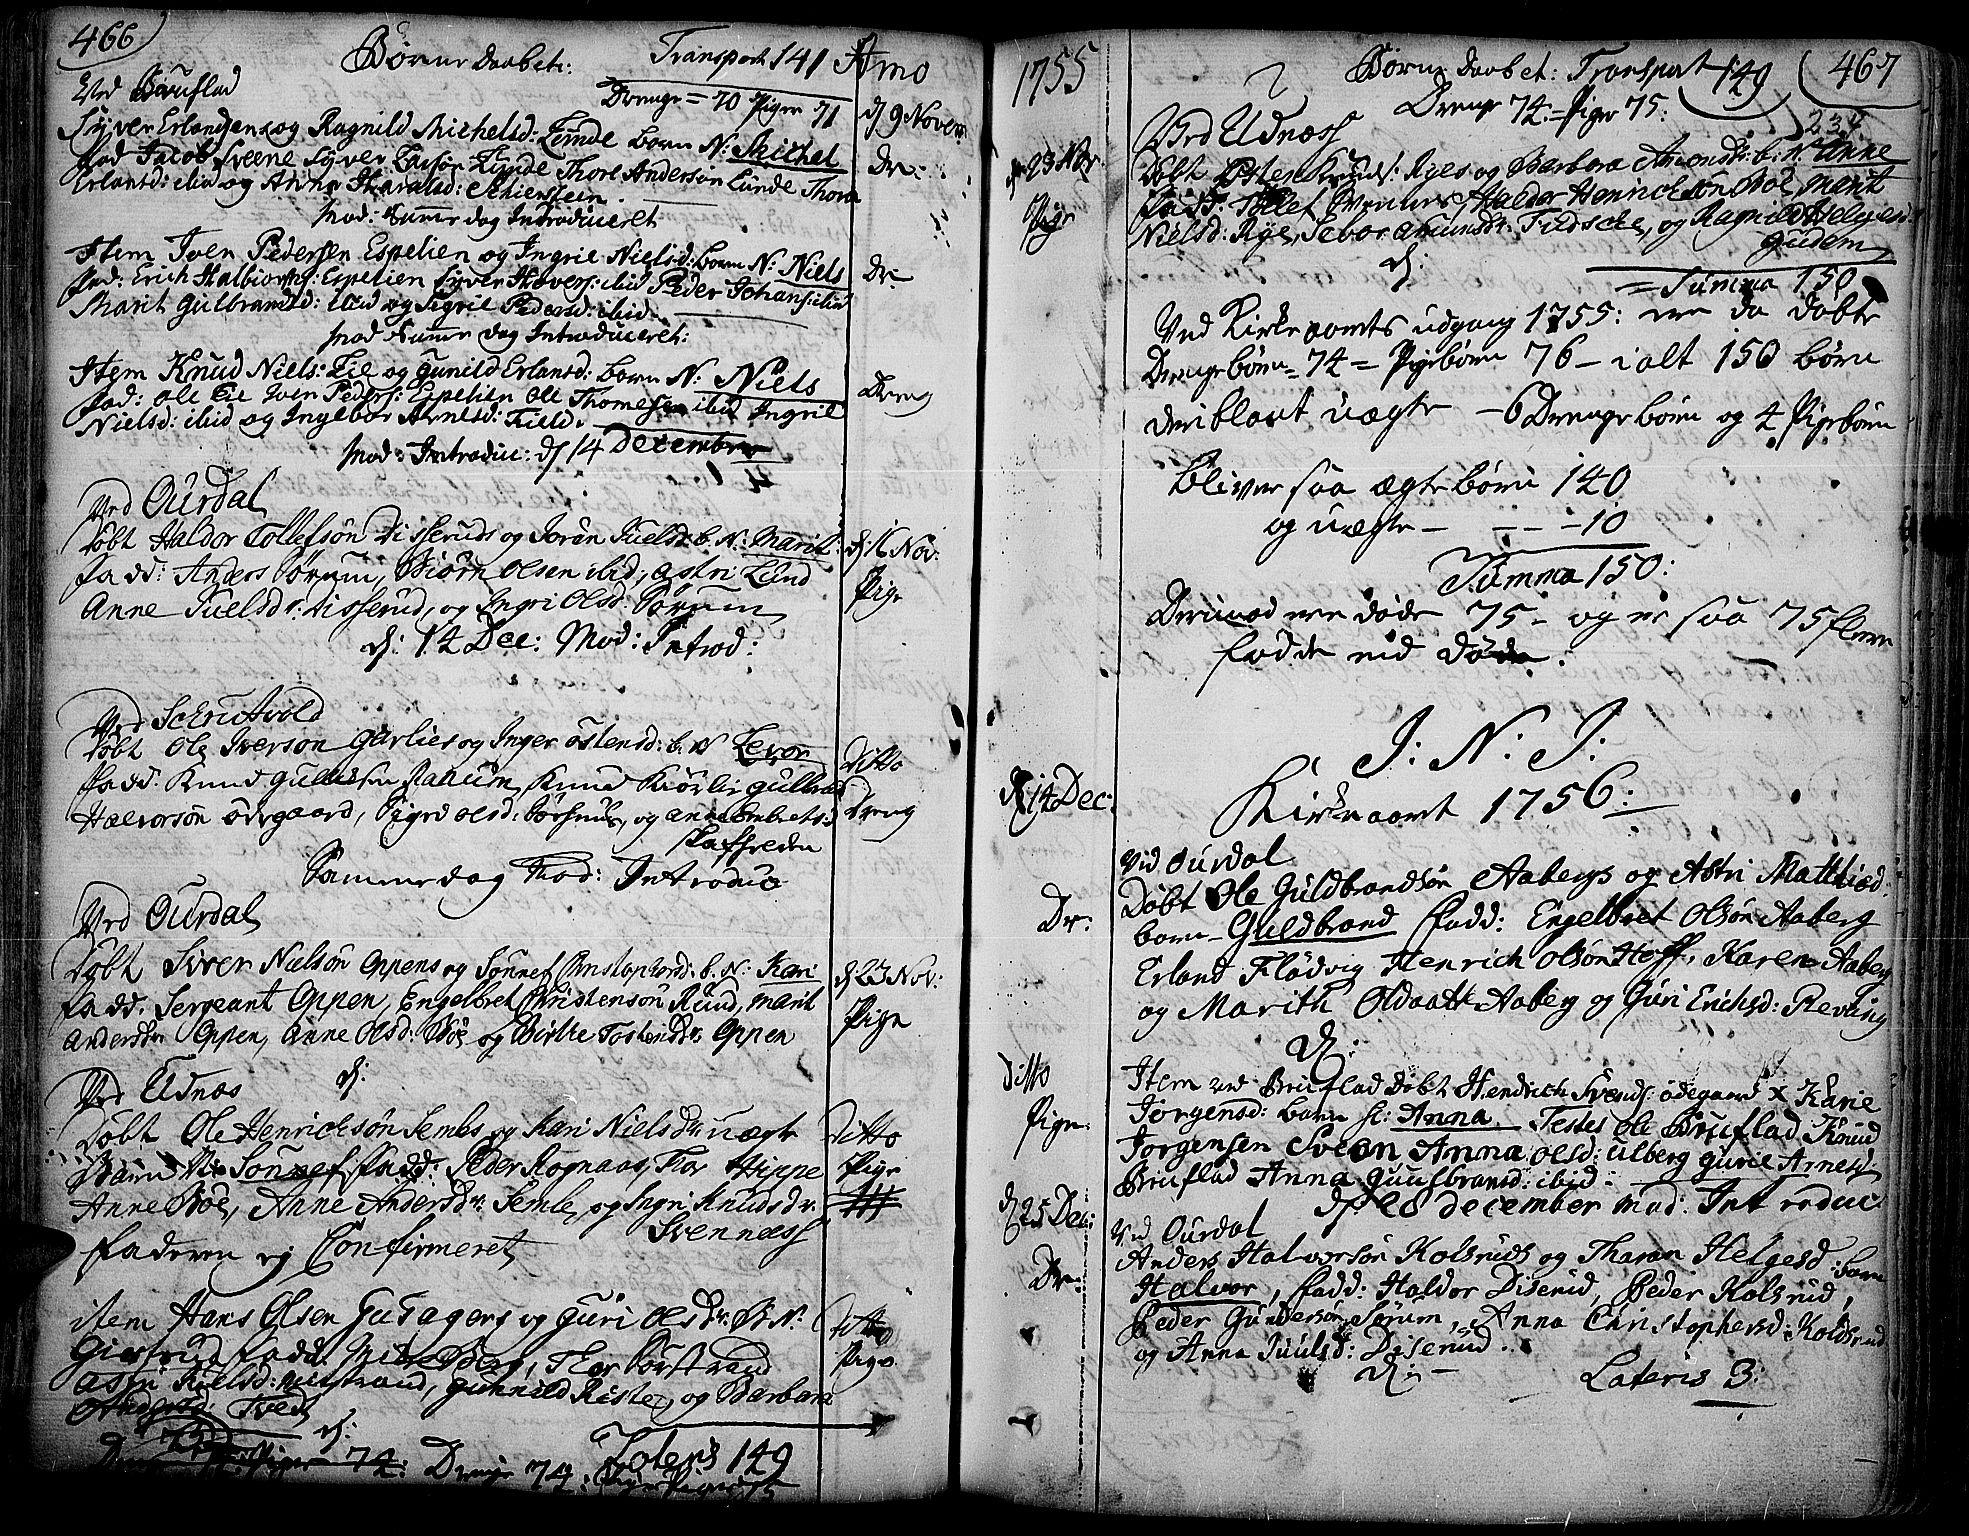 SAH, Aurdal prestekontor, Ministerialbok nr. 4, 1730-1762, s. 466-467